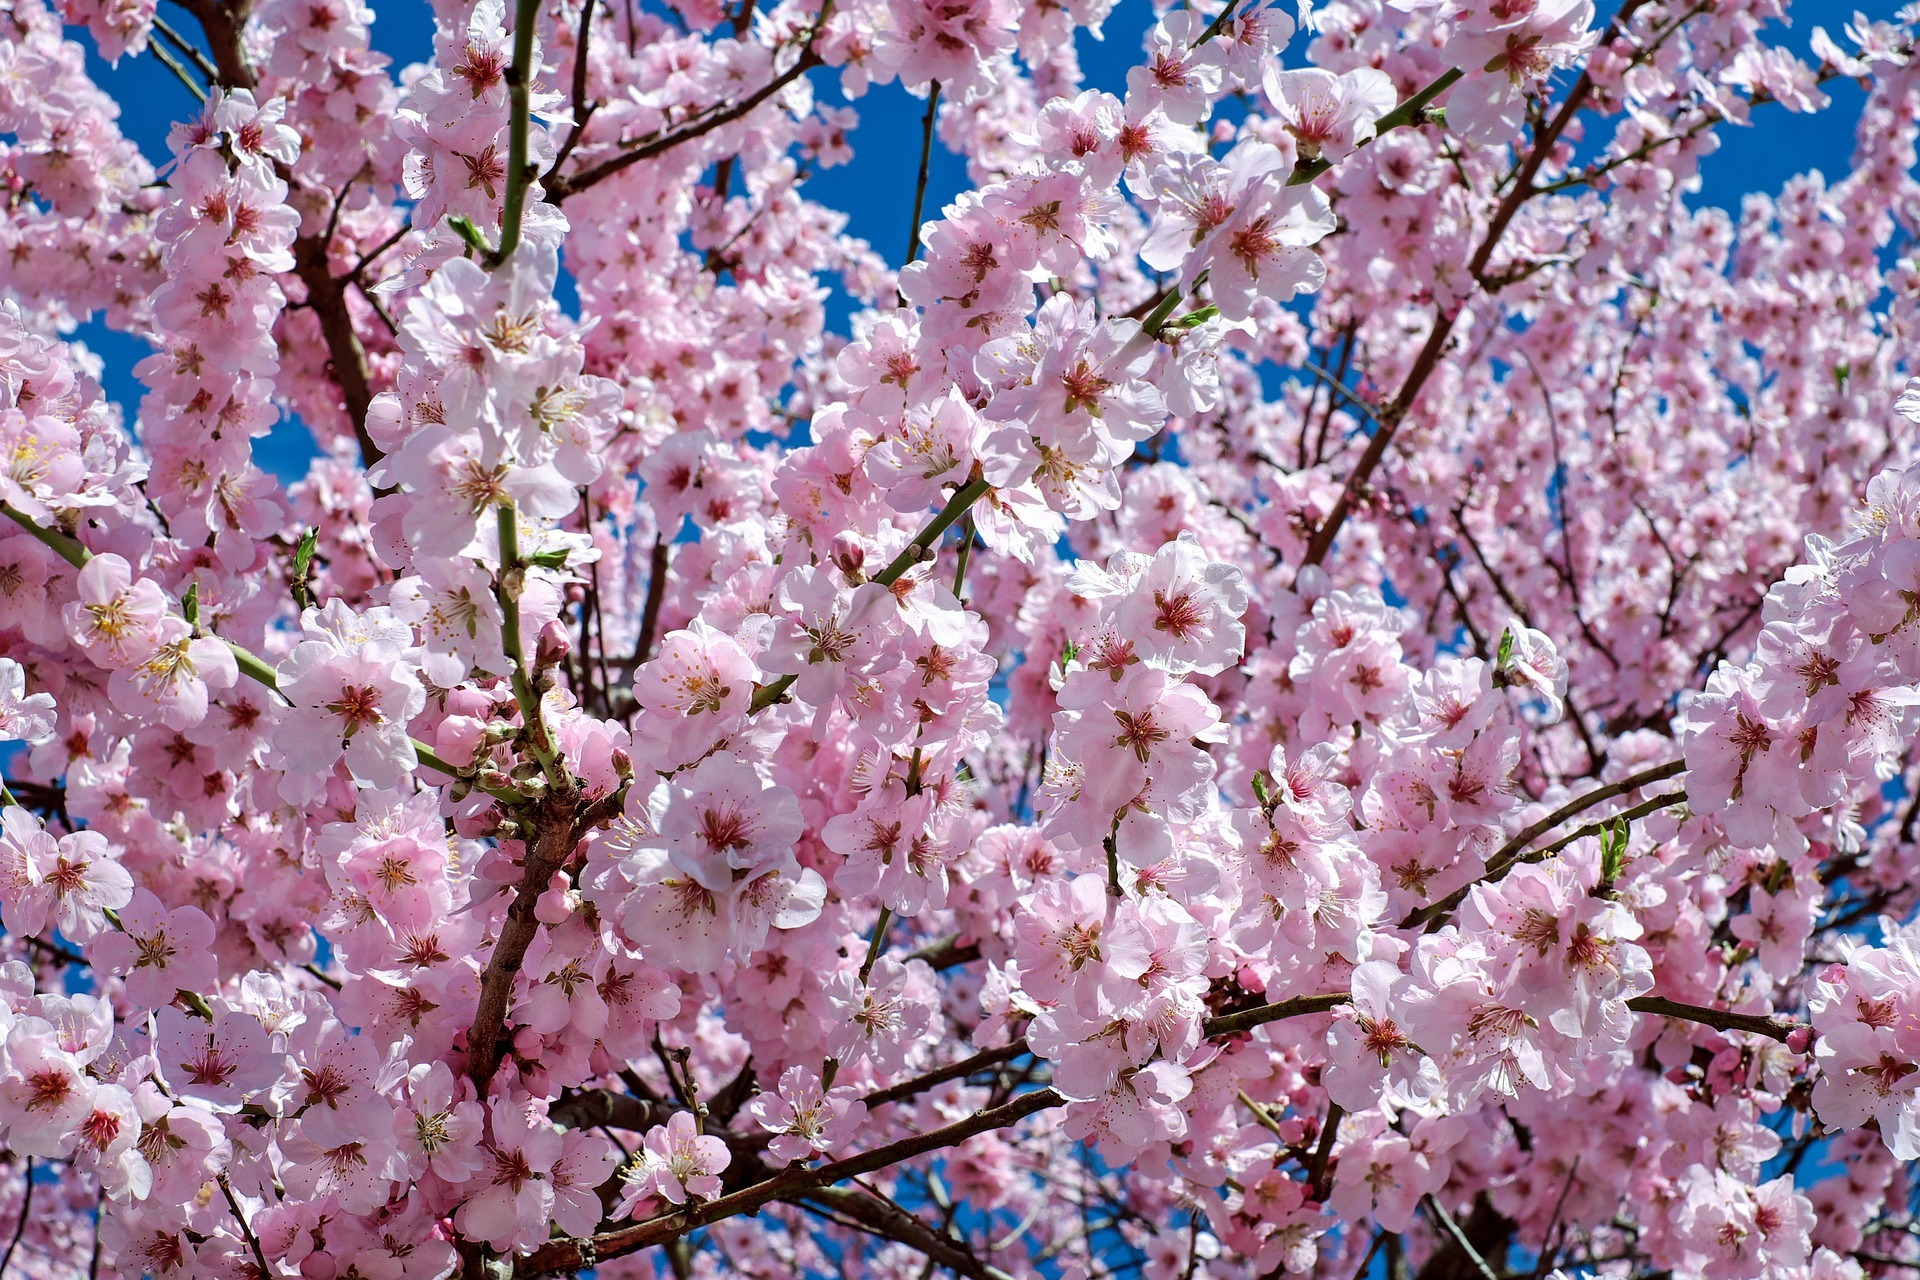 japanese-cherry-trees-2168858_1920.jpg